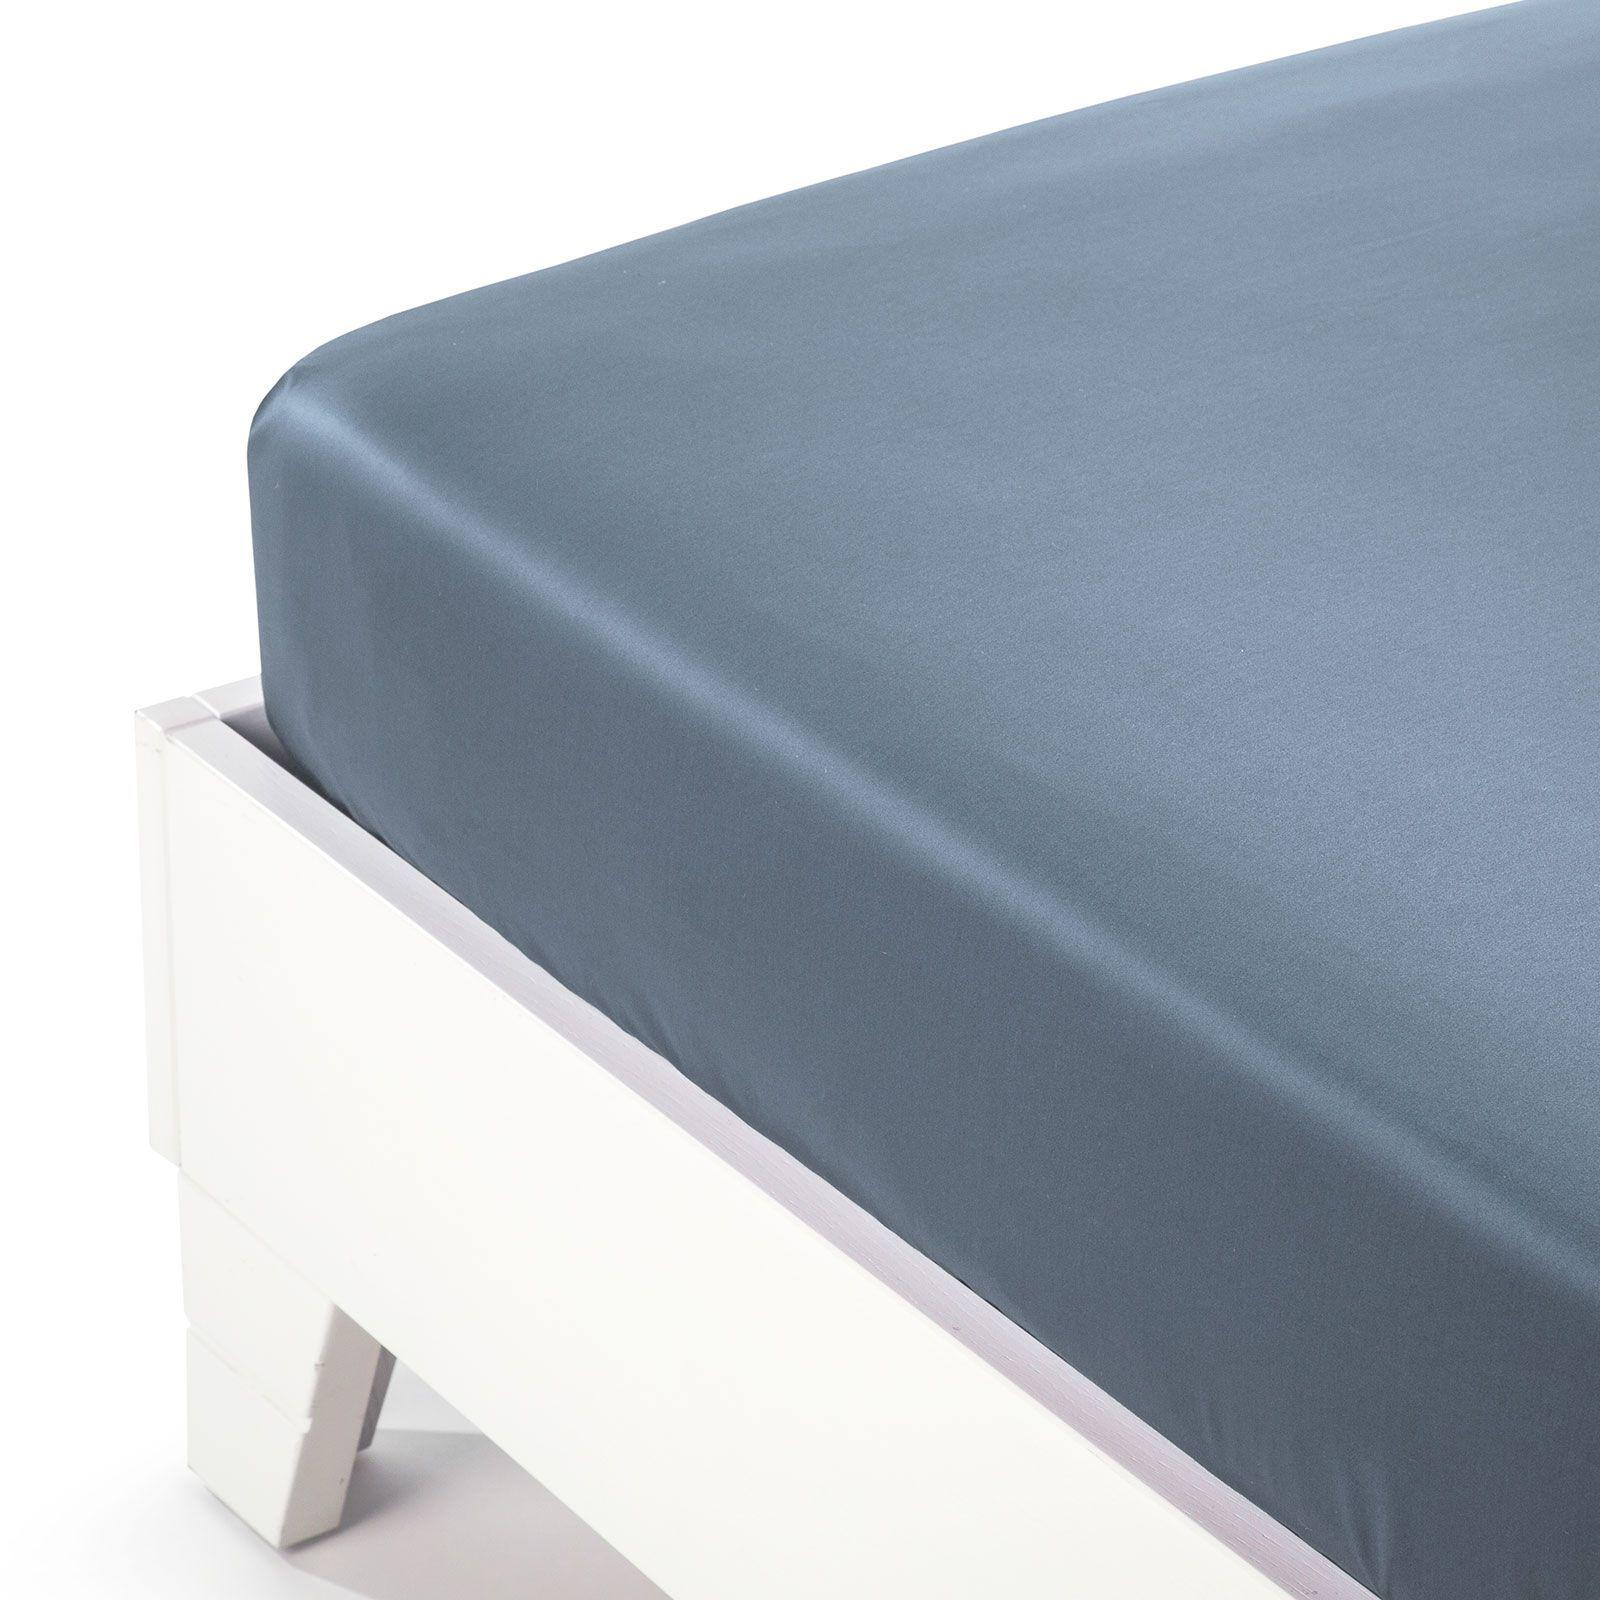 Простыни на резинке Простыня на резинке 180x200 Сaleffi Raso Tinta Unito с бордюром сатин синяя prostynya-na-rezinke-160x200-saleffi-raso-tinta-unito-s-bordyurom-satin-avio-italiya.jpg